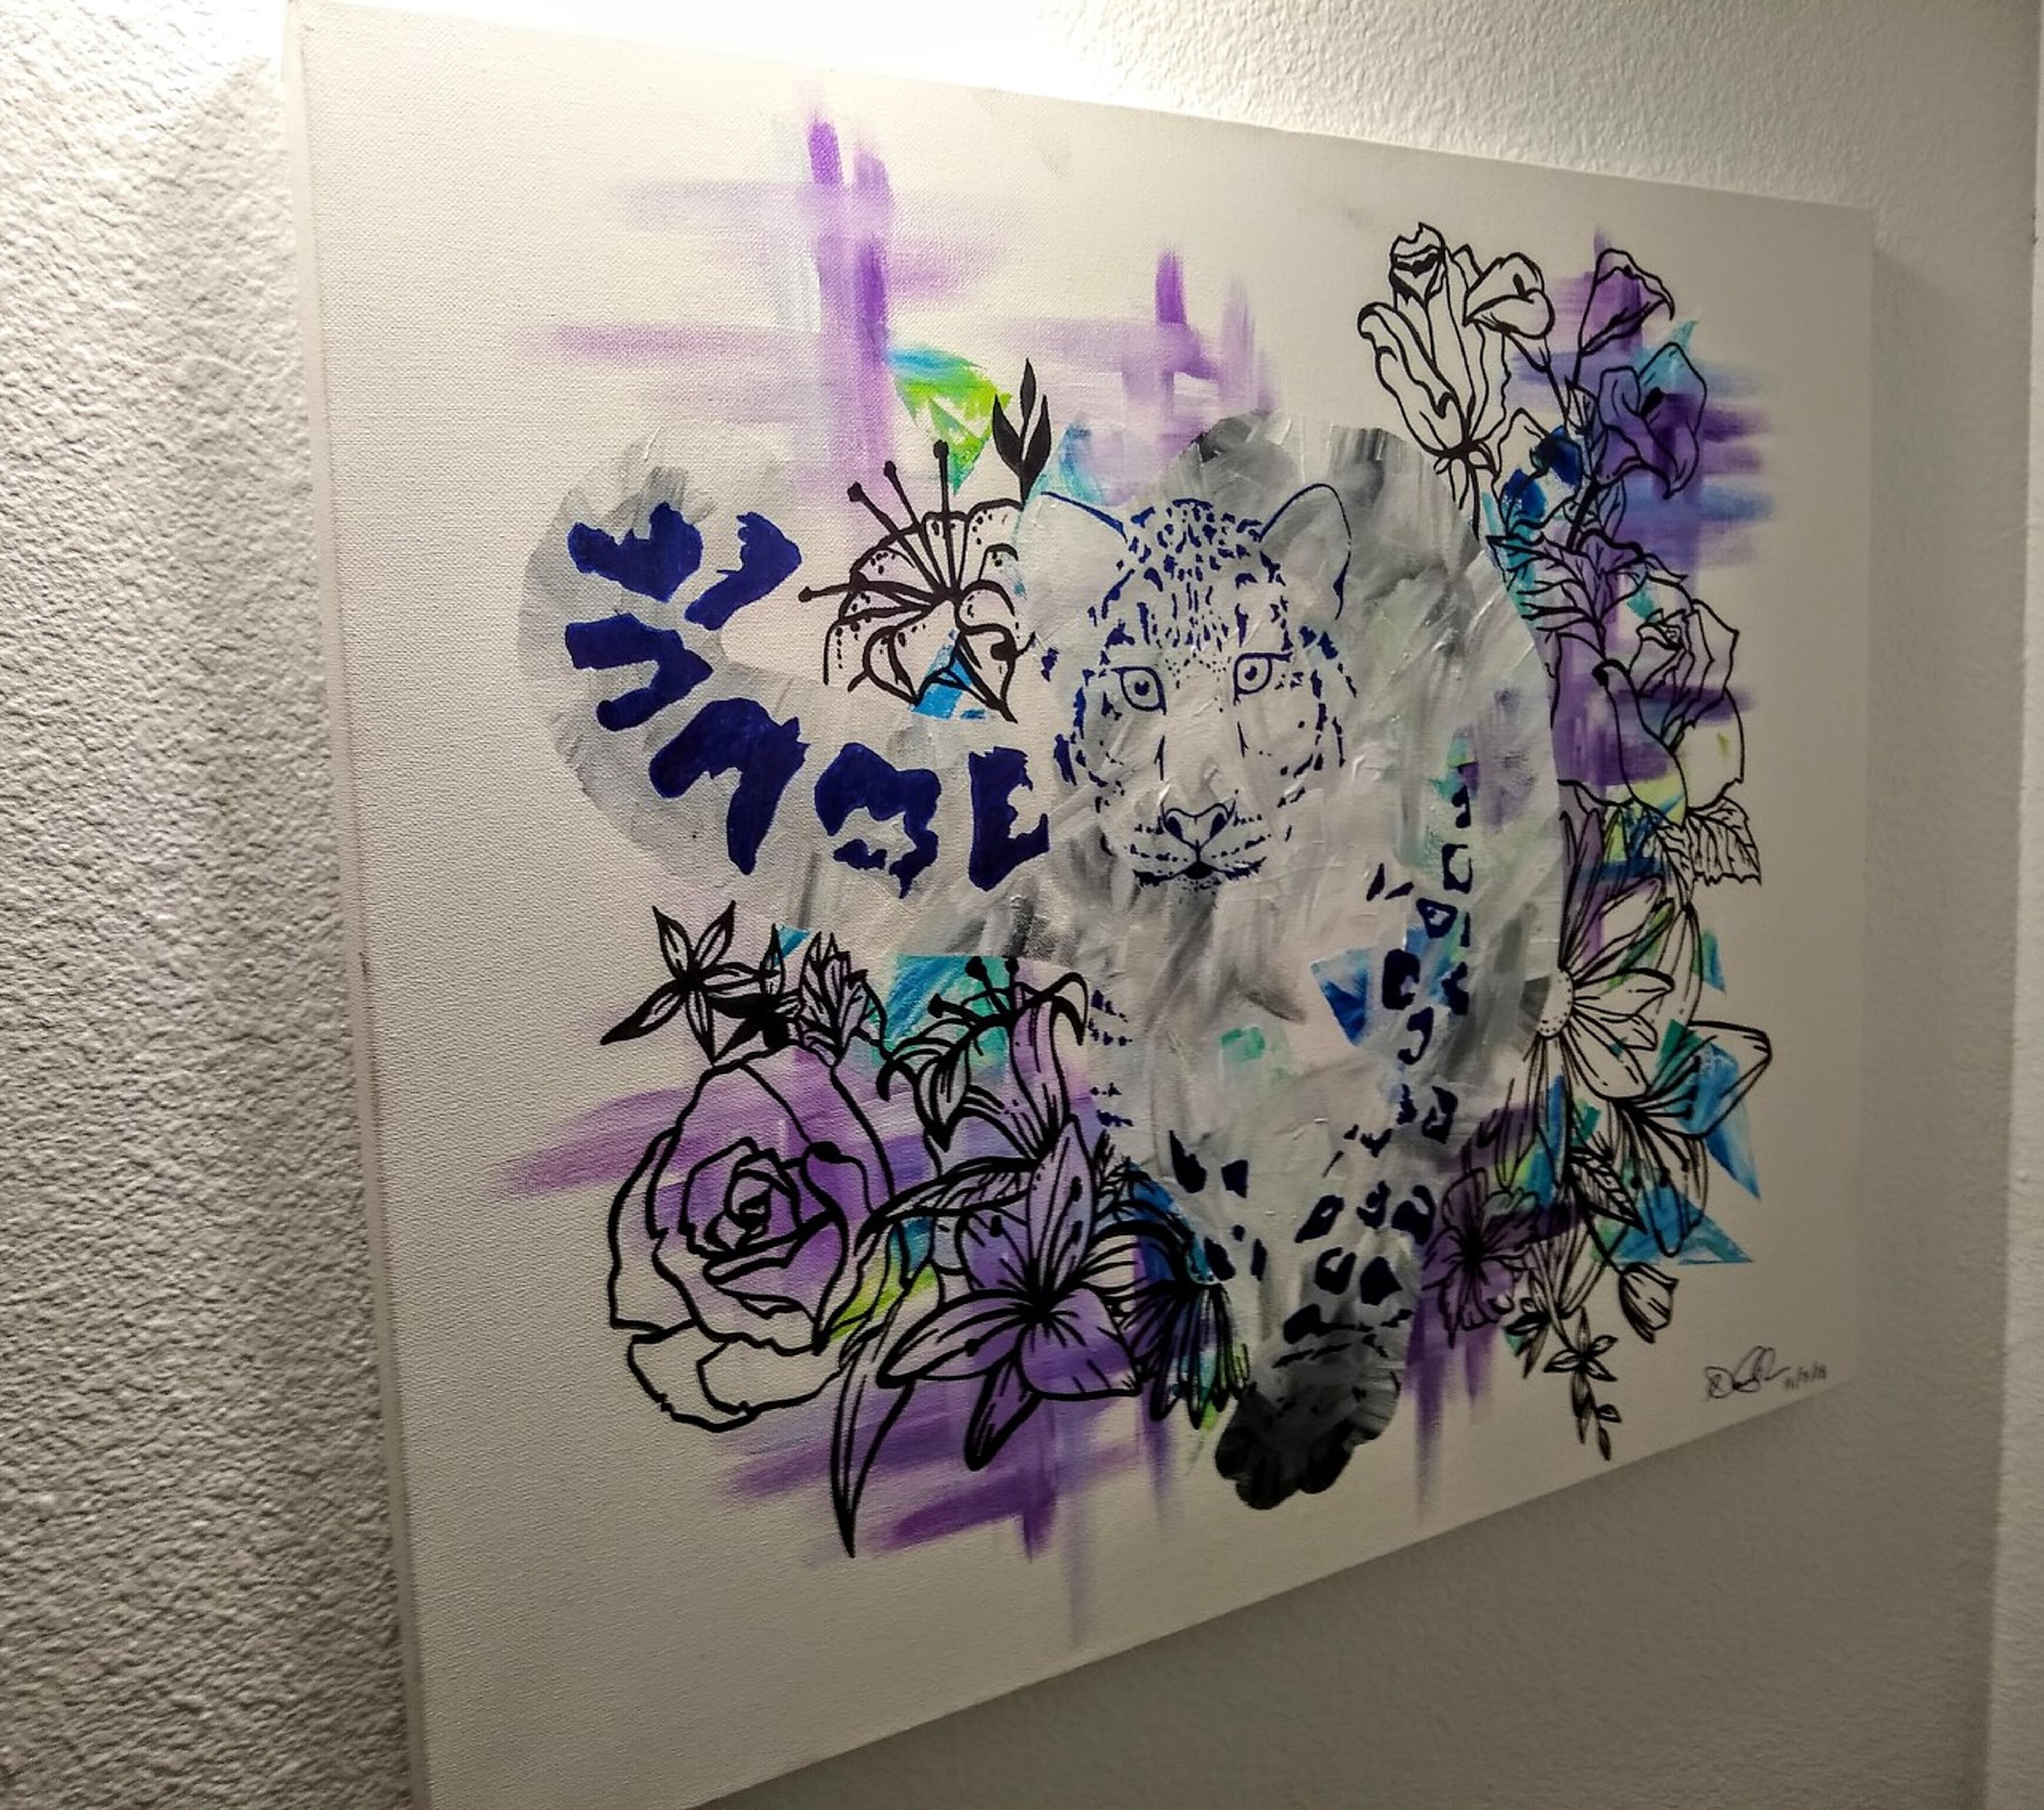 Snow Leopard by Dane Hyman | ArtworkNetwork.com